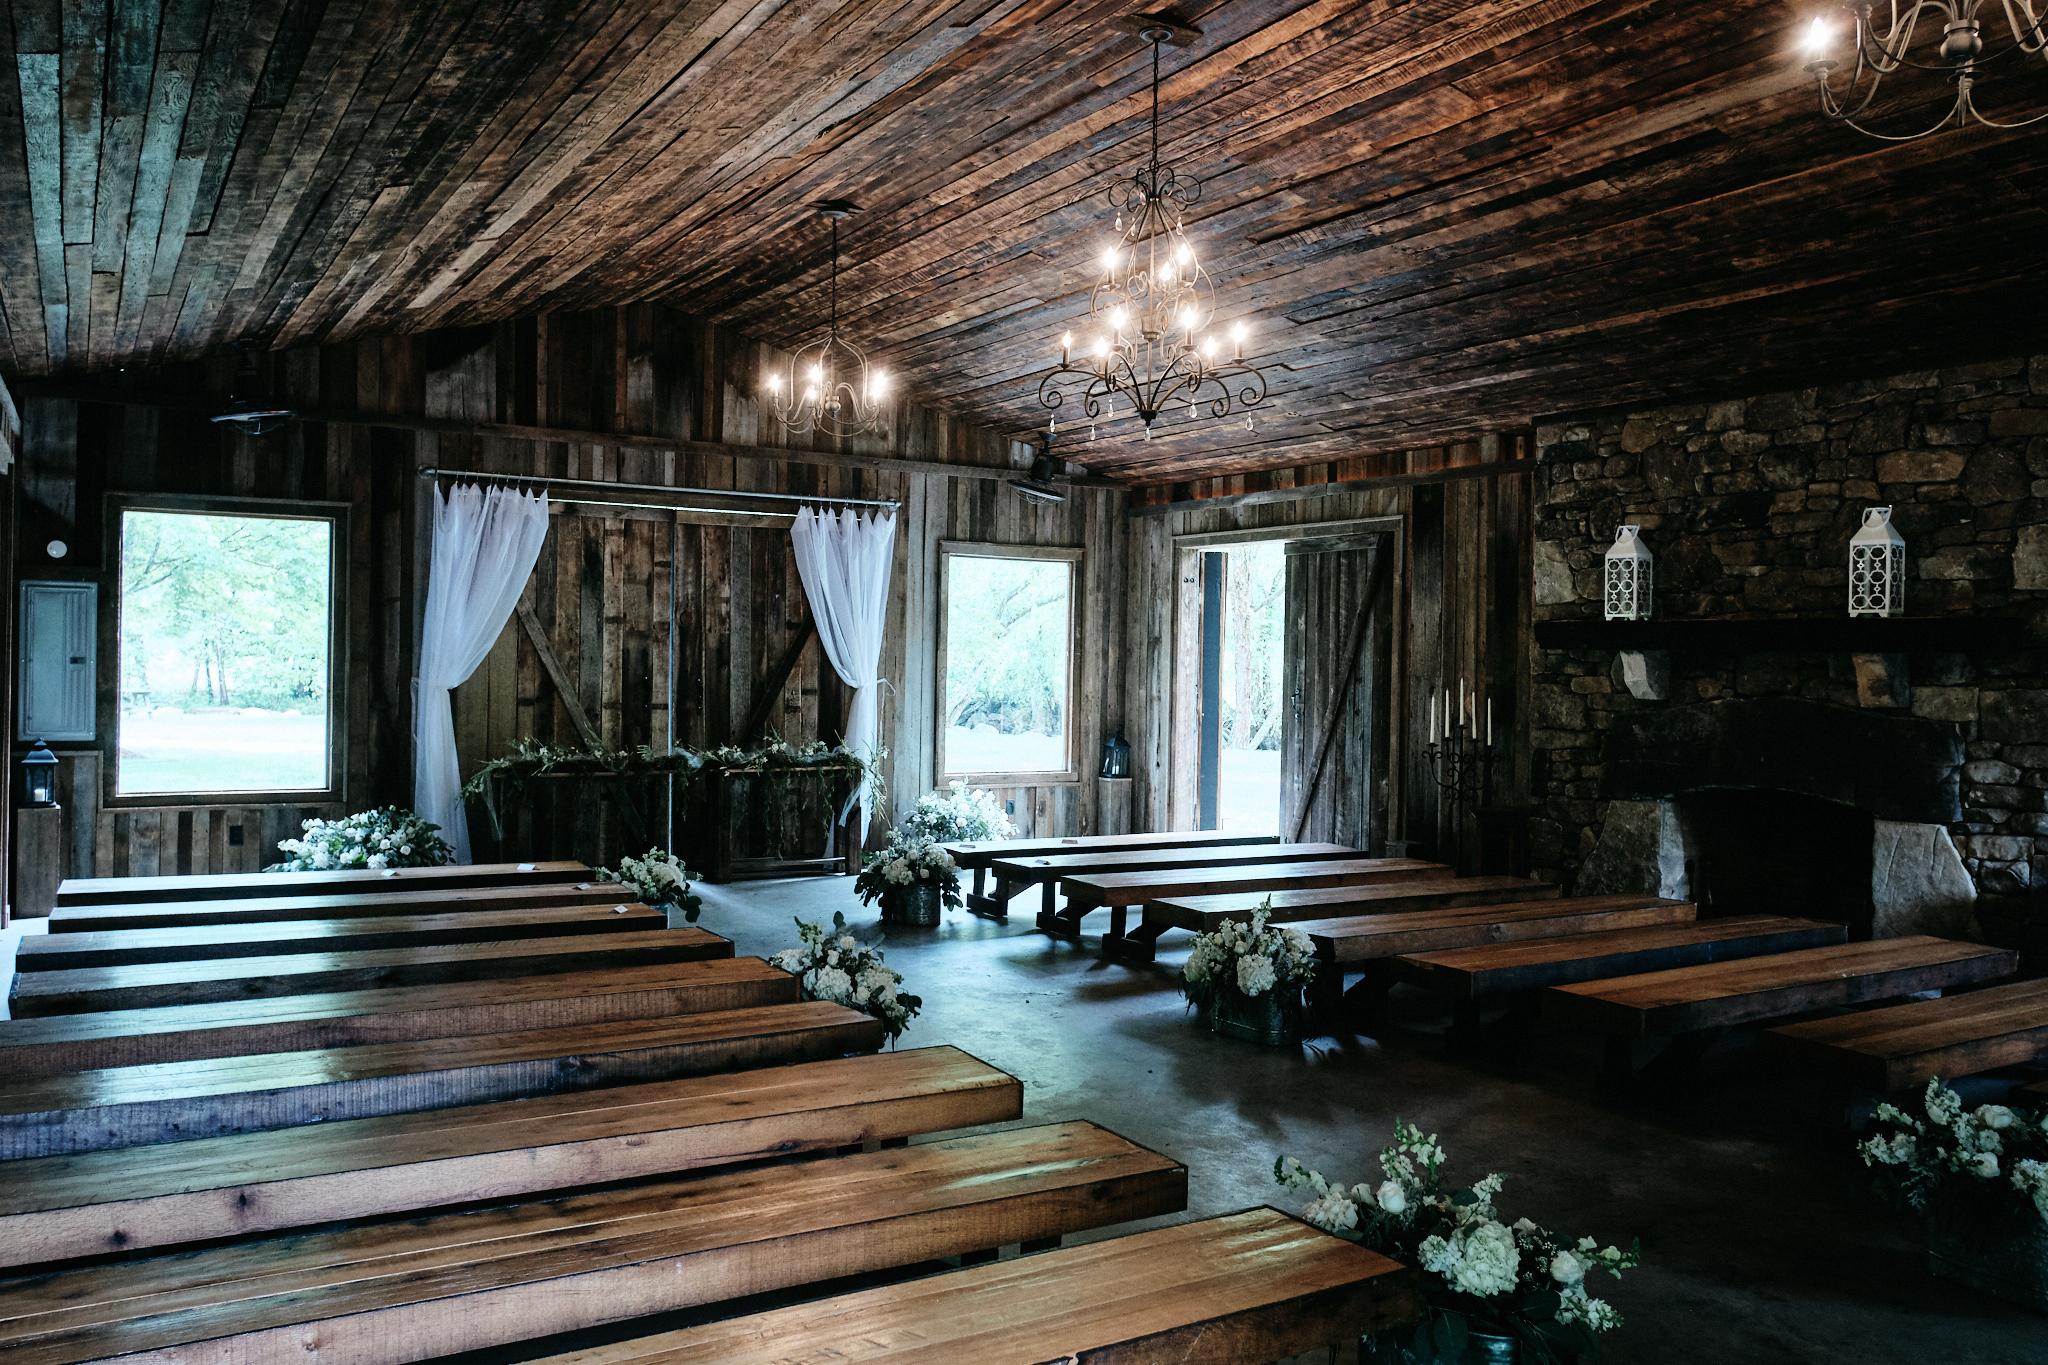 Hiawassee river Chapel interior